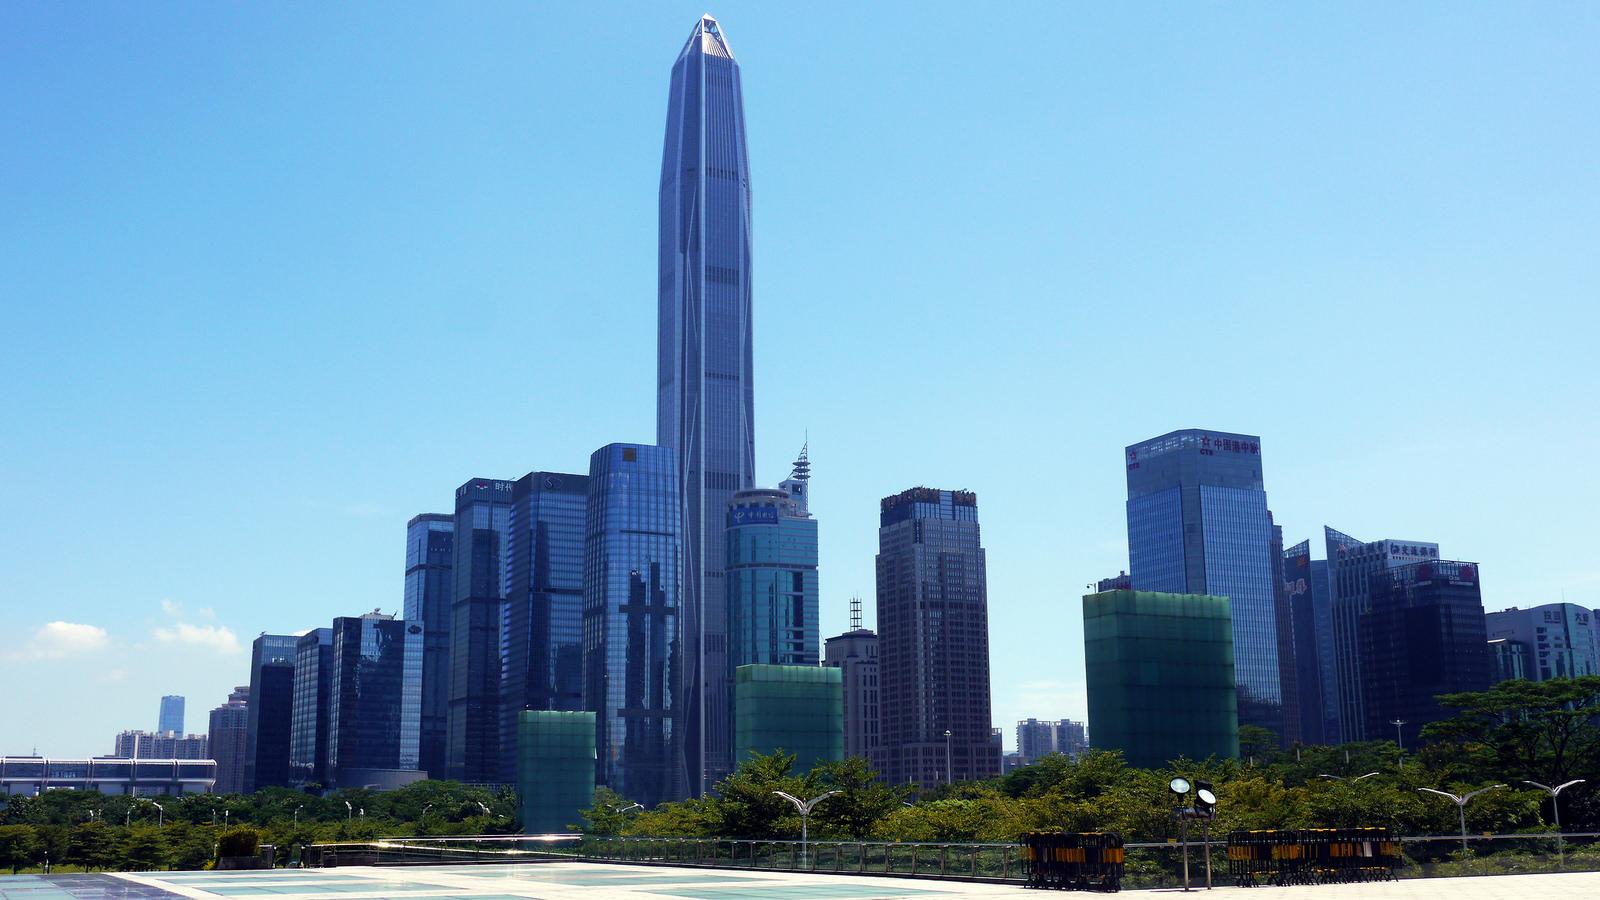 Capital Market Authority Headquarters